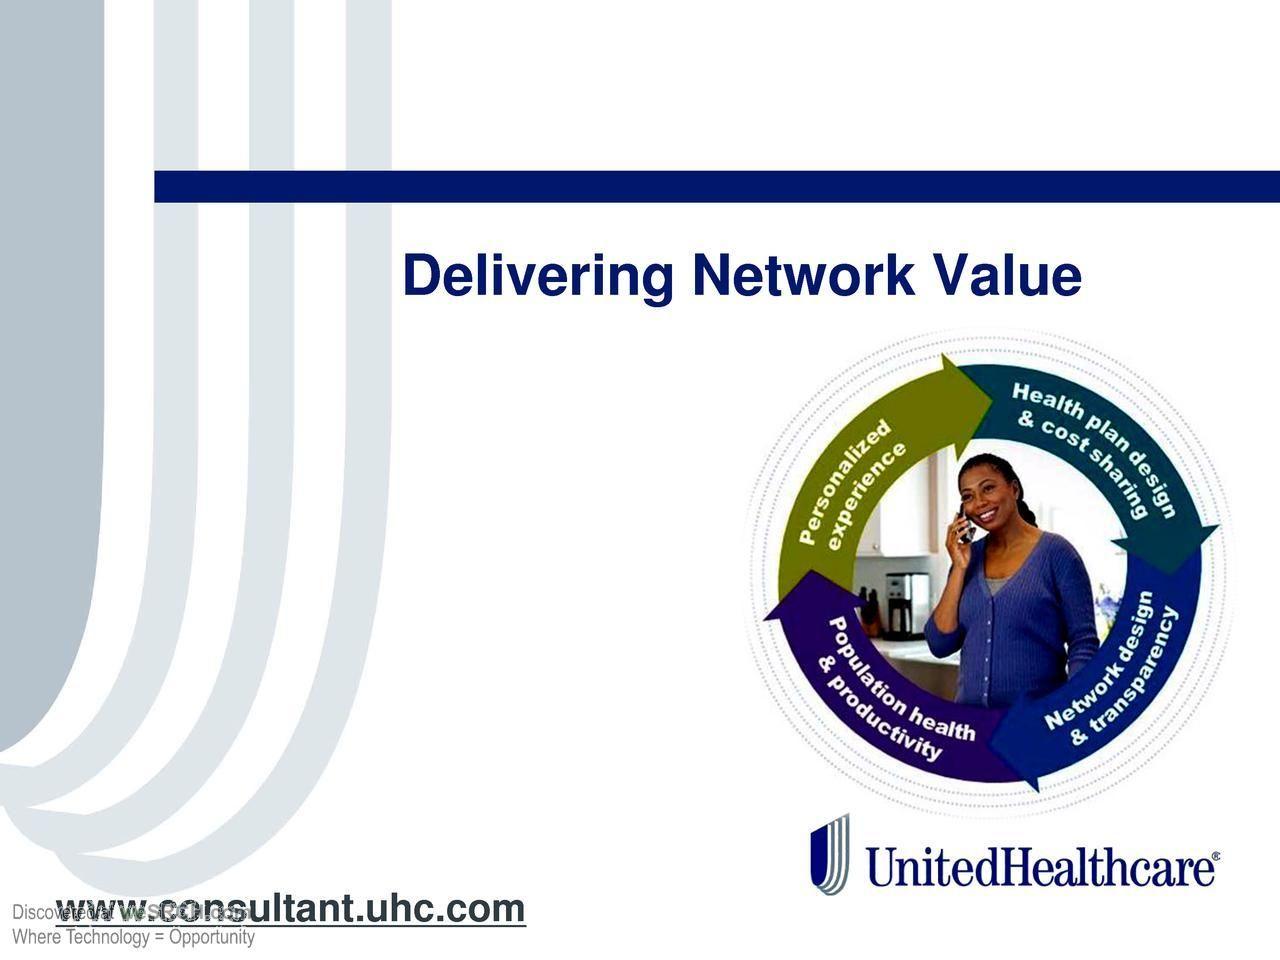 #DeliveringNetwork Value through individual #health ownership, #Medical